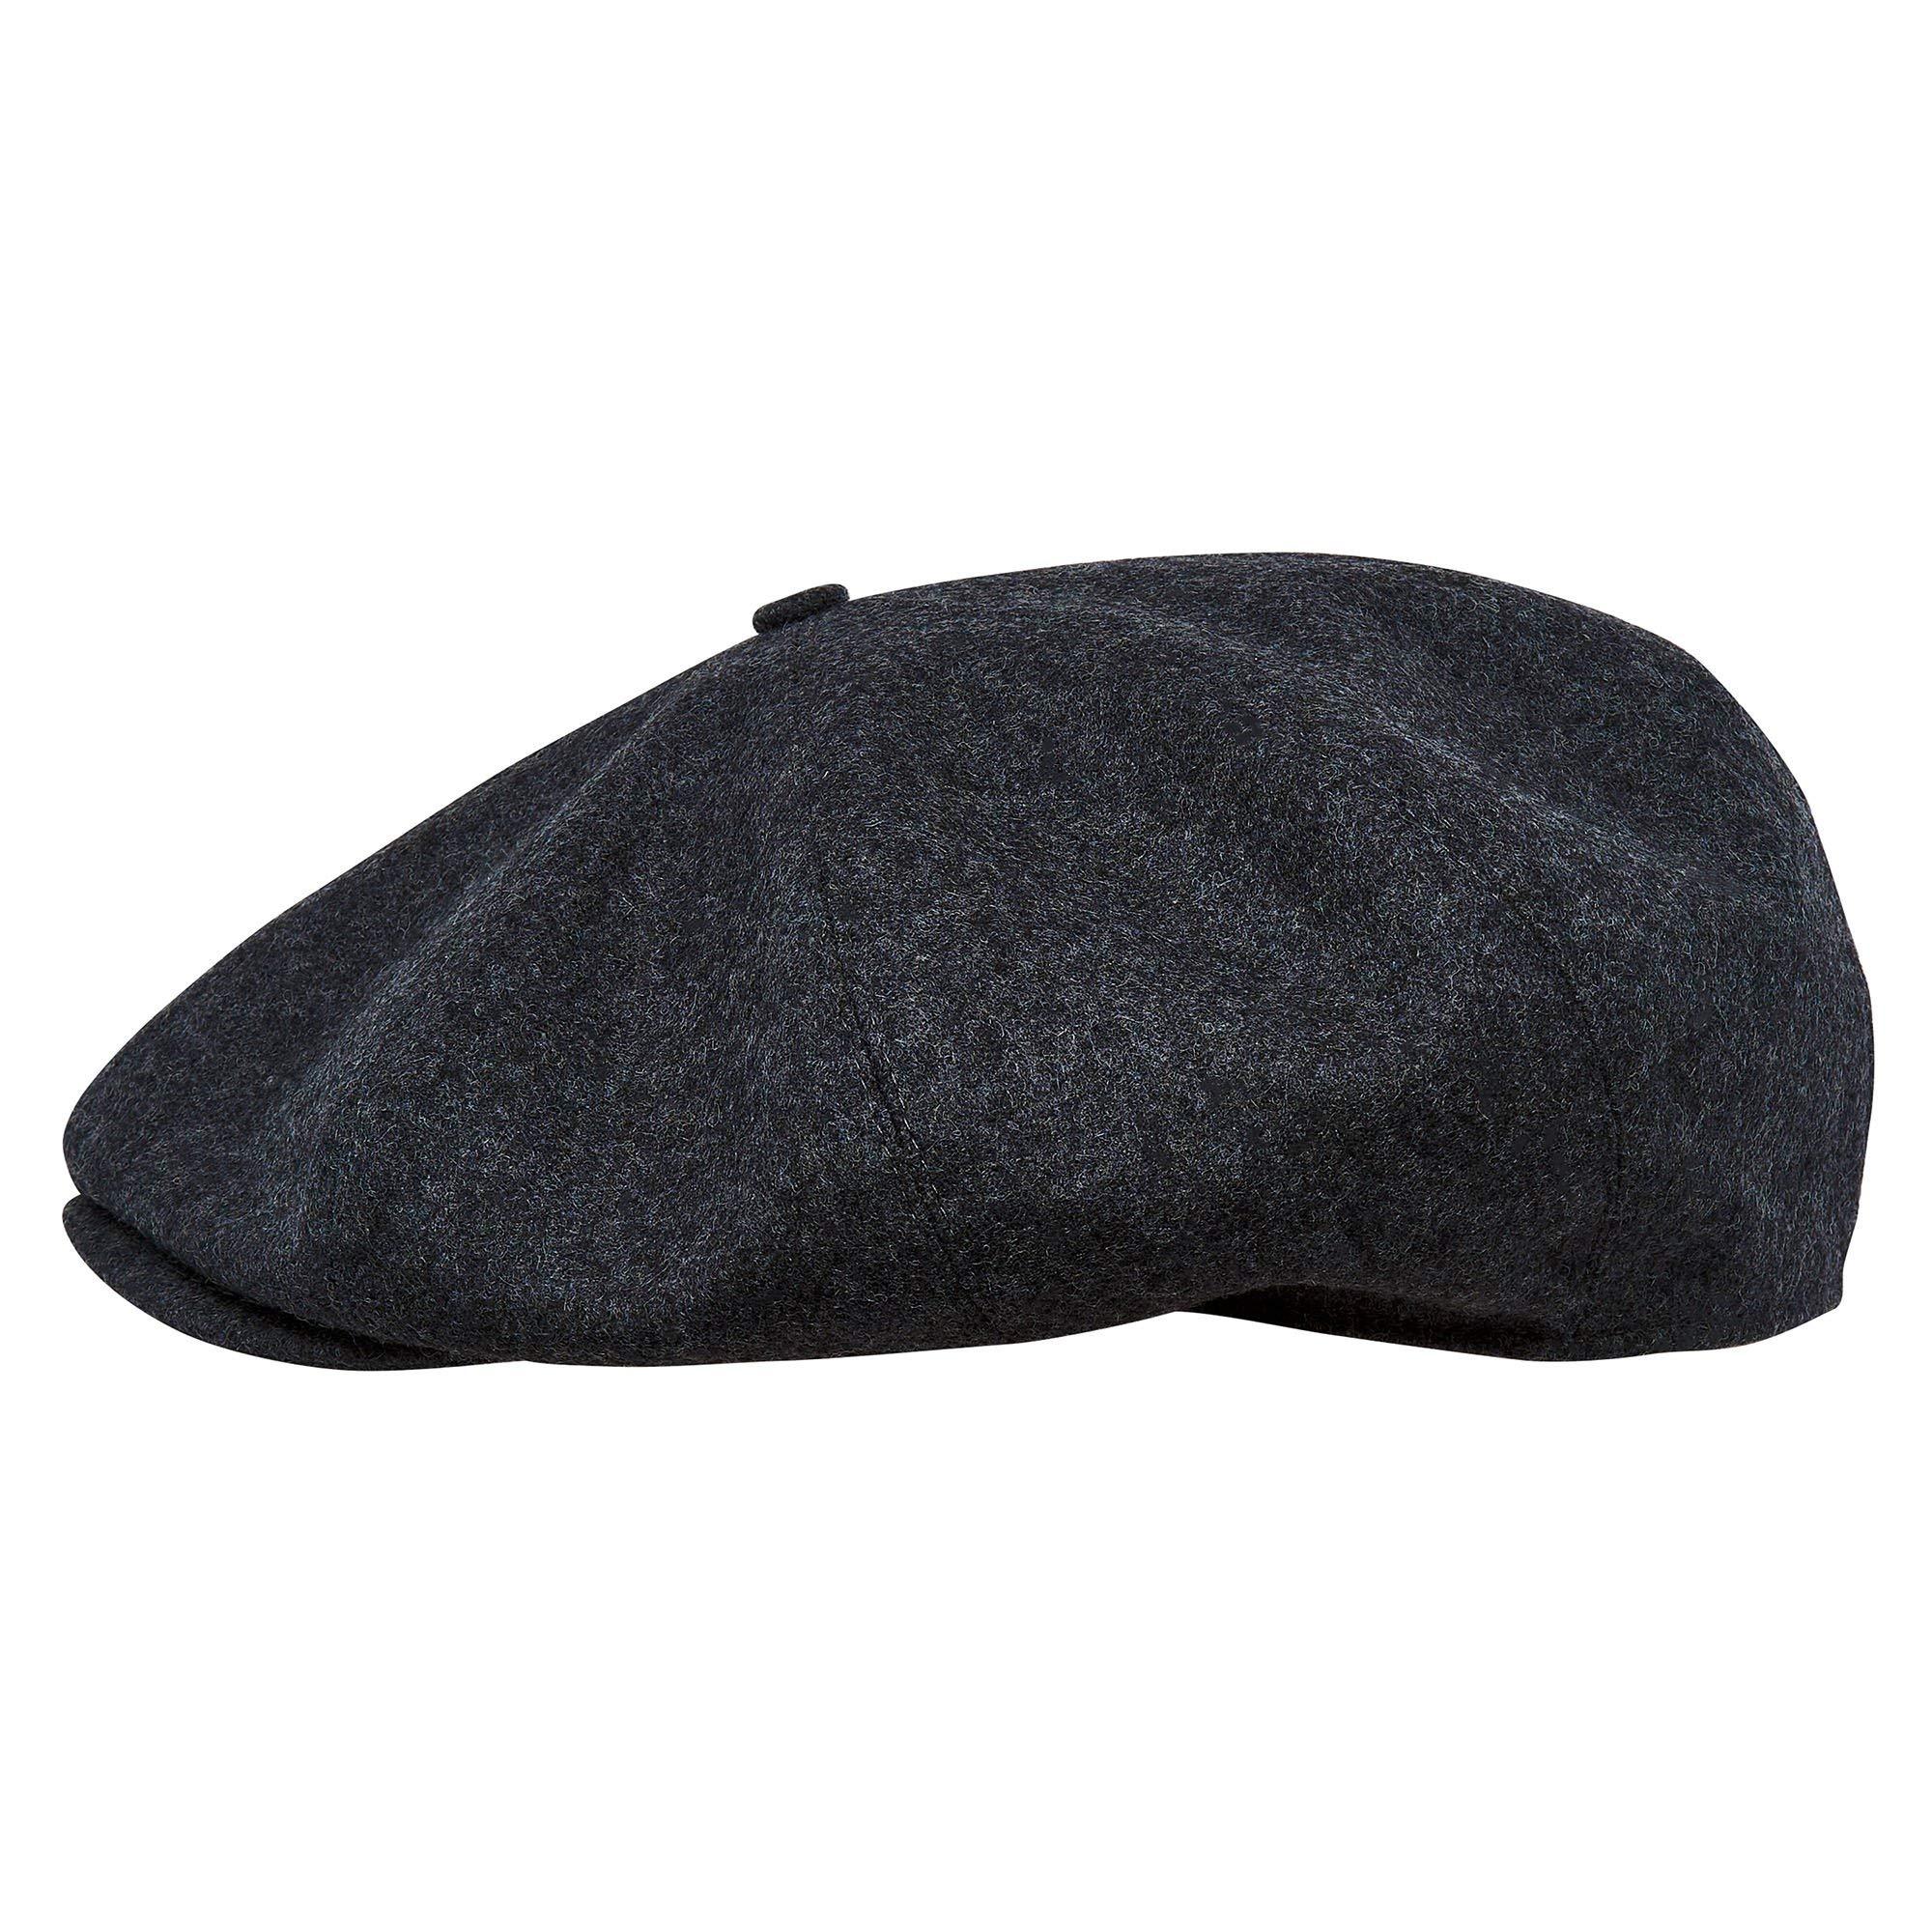 Sterkowski Peaky Blinders Cap | Wool Newsboy Cap for Men | Warm Classic 8 Panels Hat